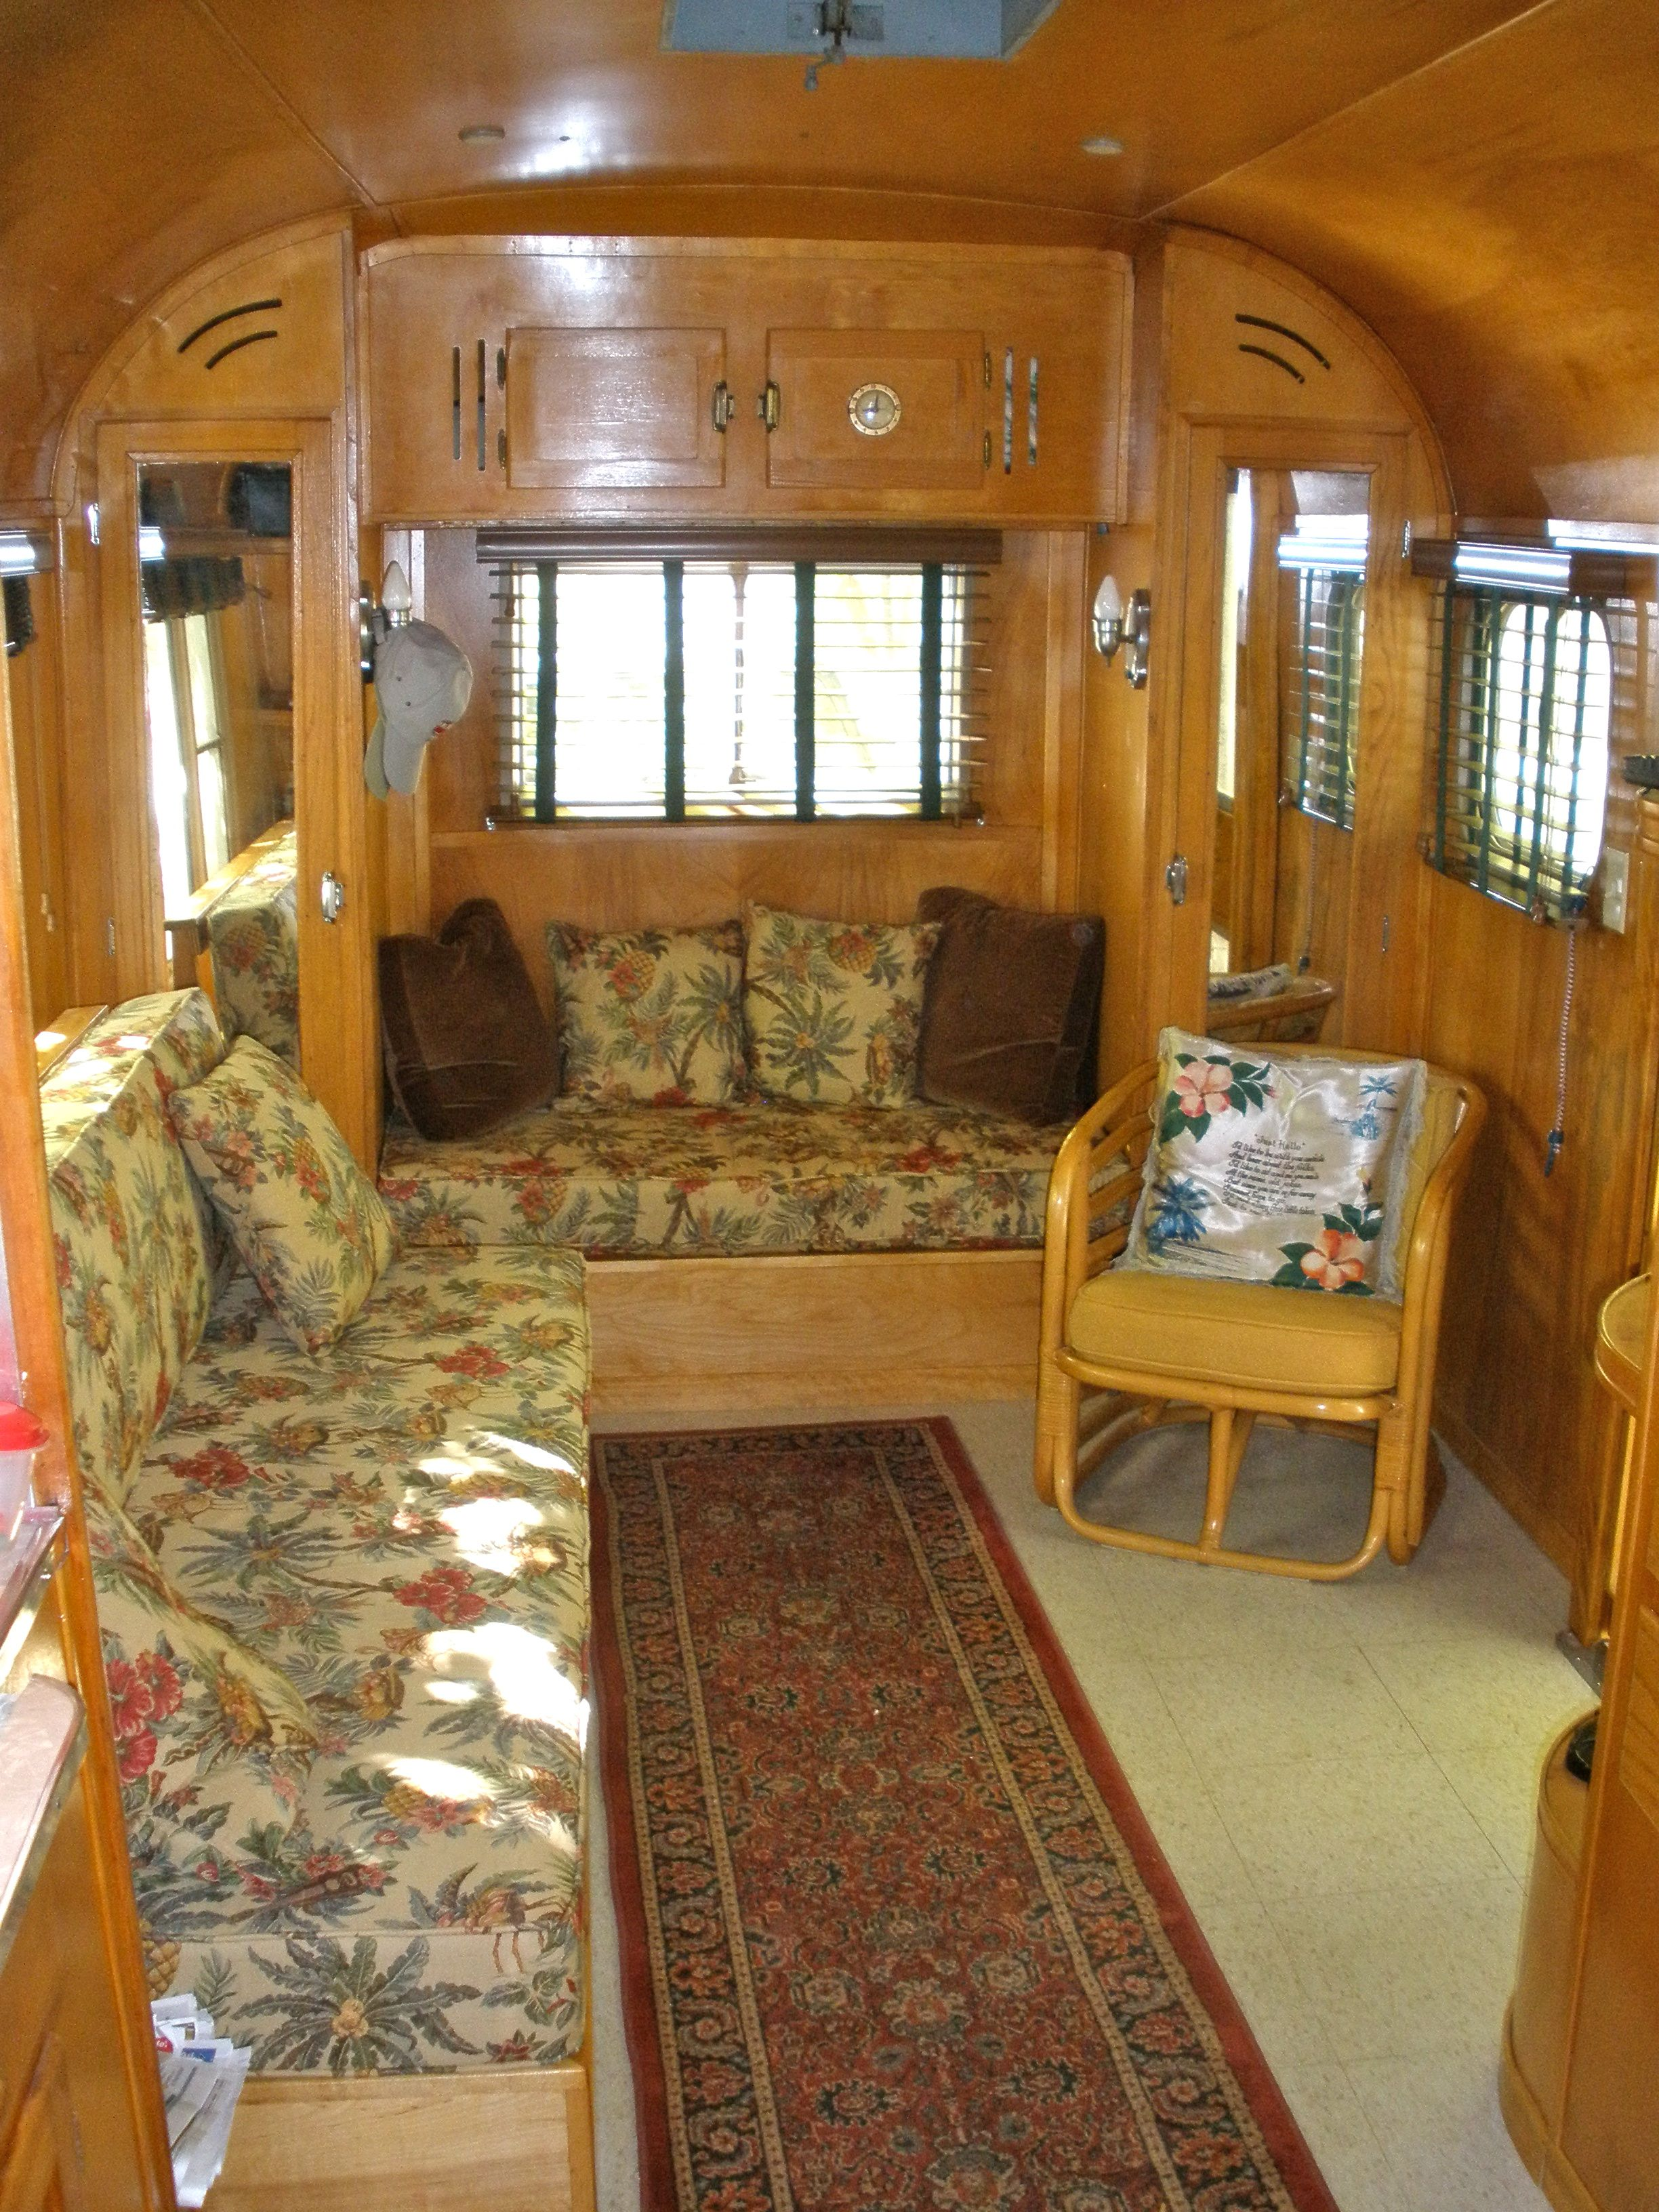 Travel Trailer is a 1954 Prairie Schooner Camper  |1950s Vintage Travel Trailers Inside